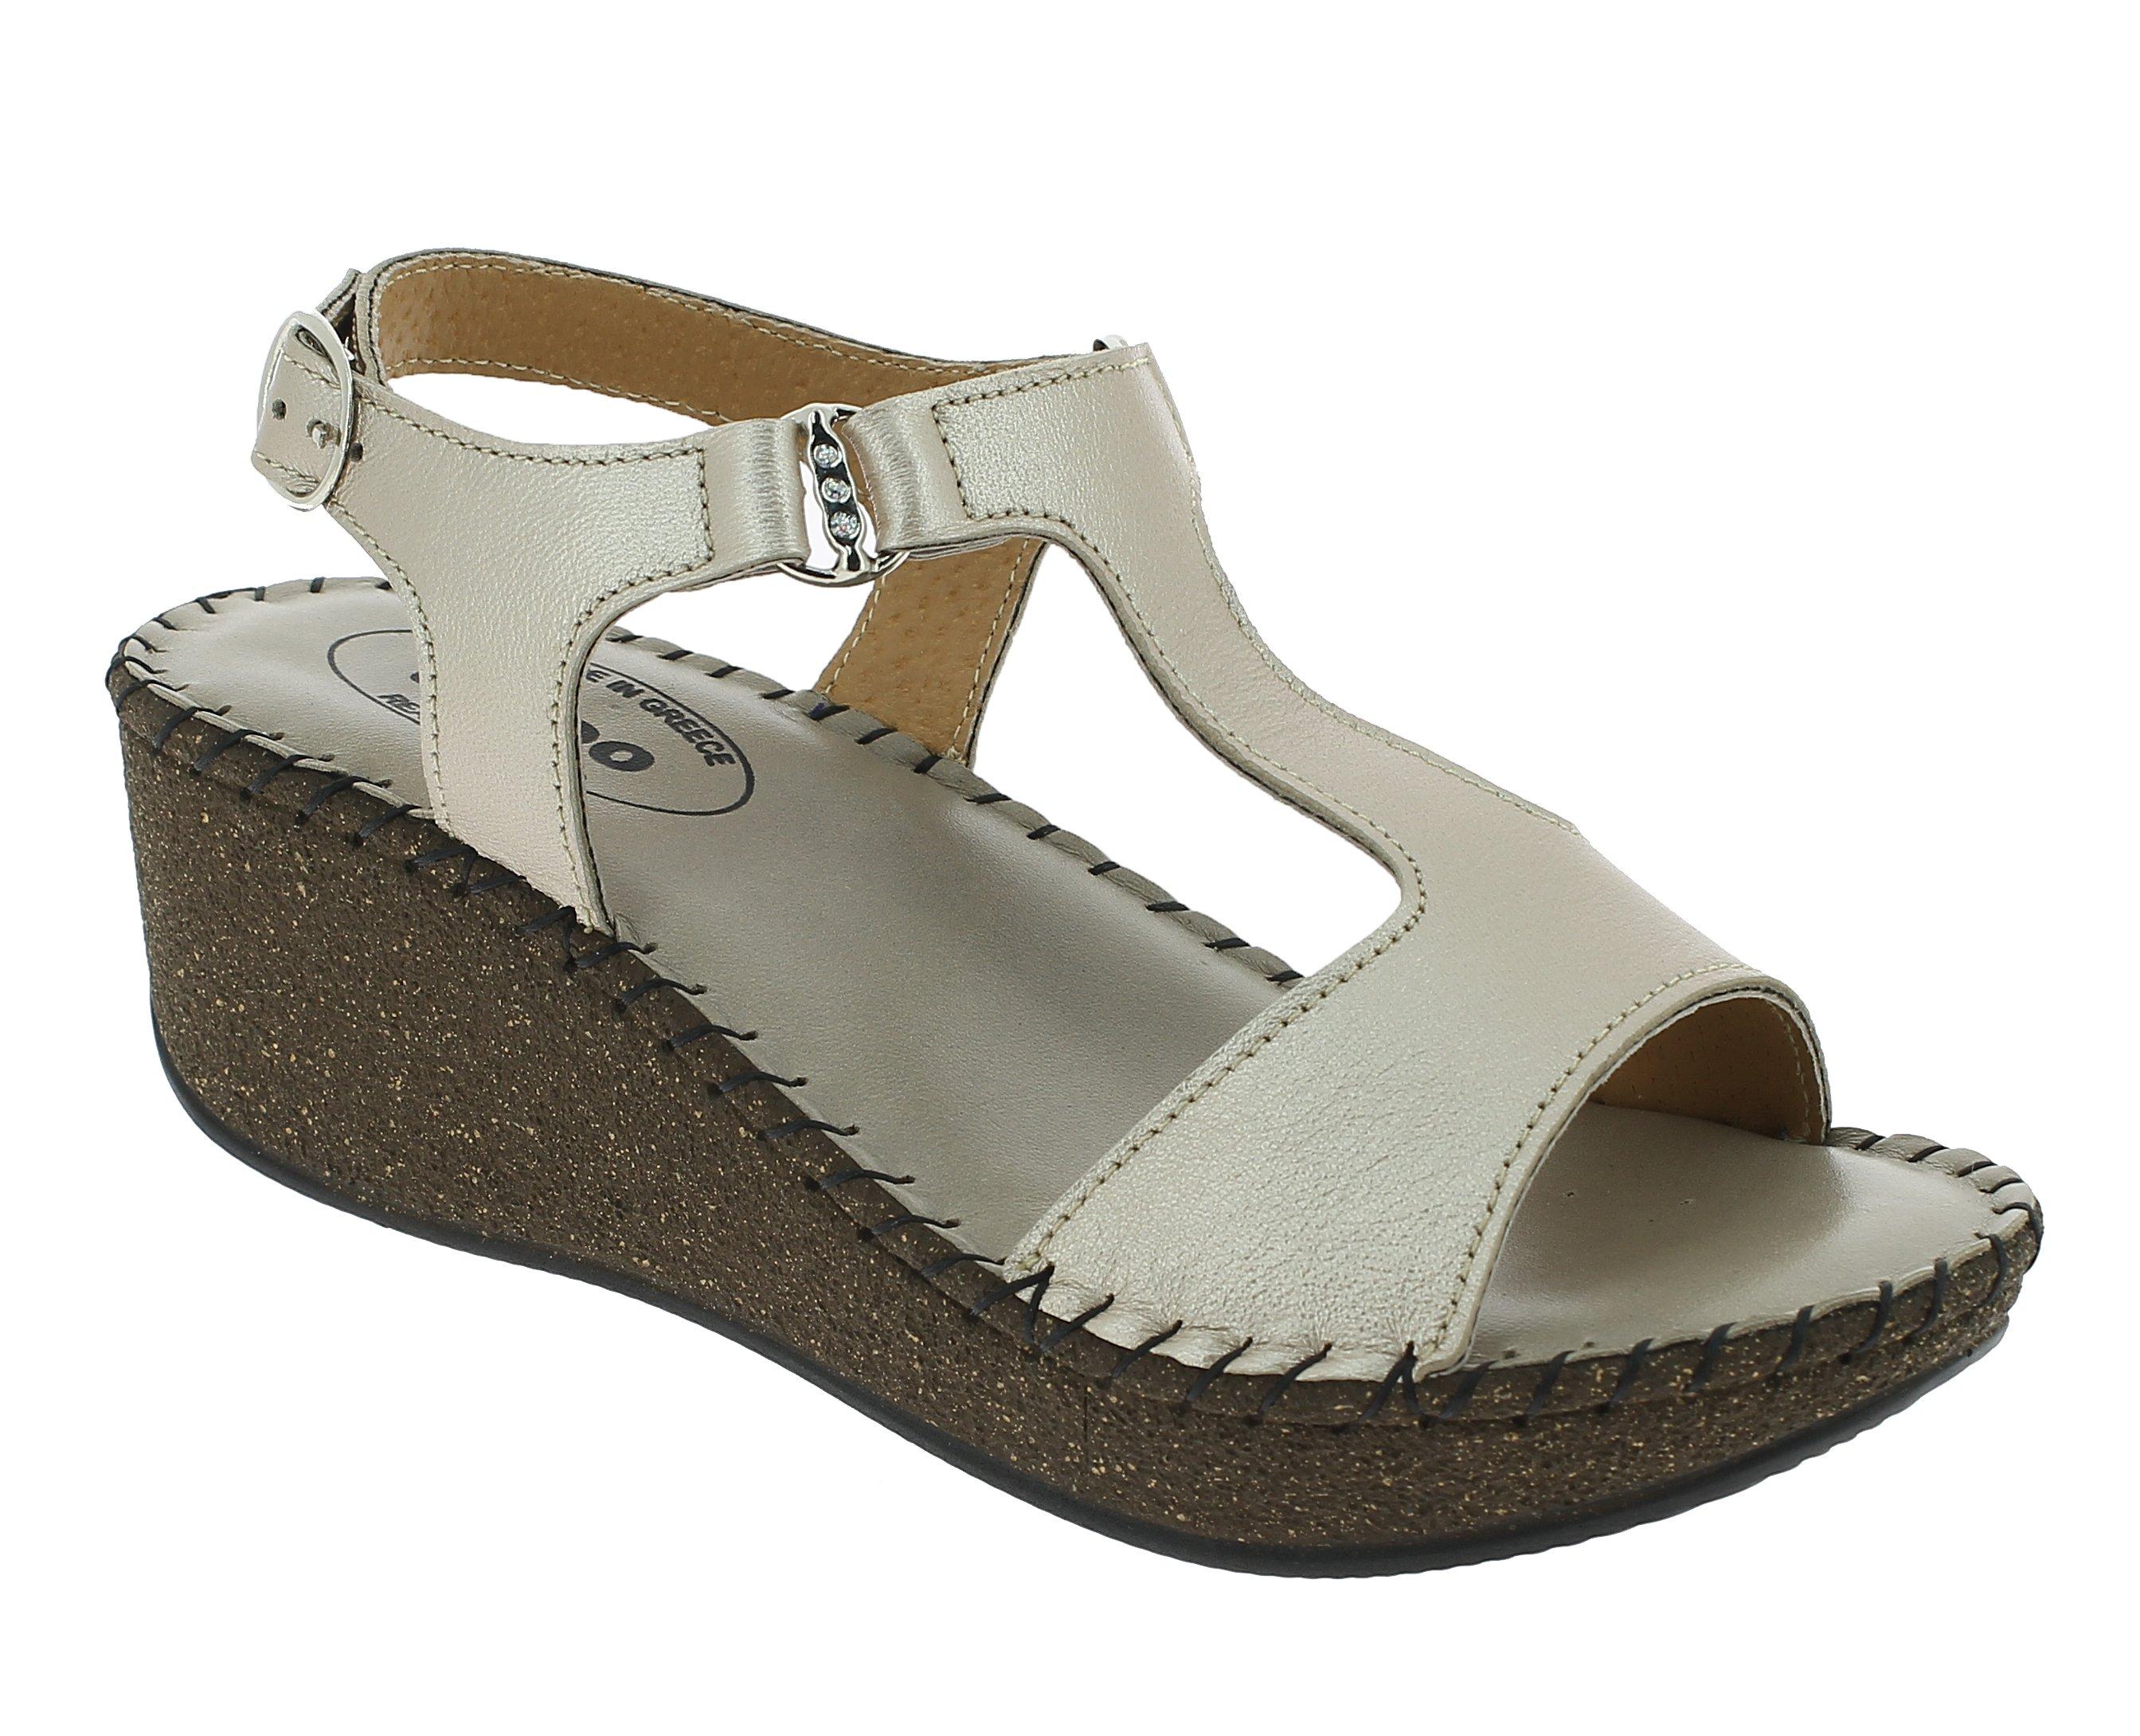 TATOO Γυναικείο Πέδιλο 4040 Μπεζ - IqShoes - 10.4040 beige 40/1/7/8 παπούτσια  πέδιλα